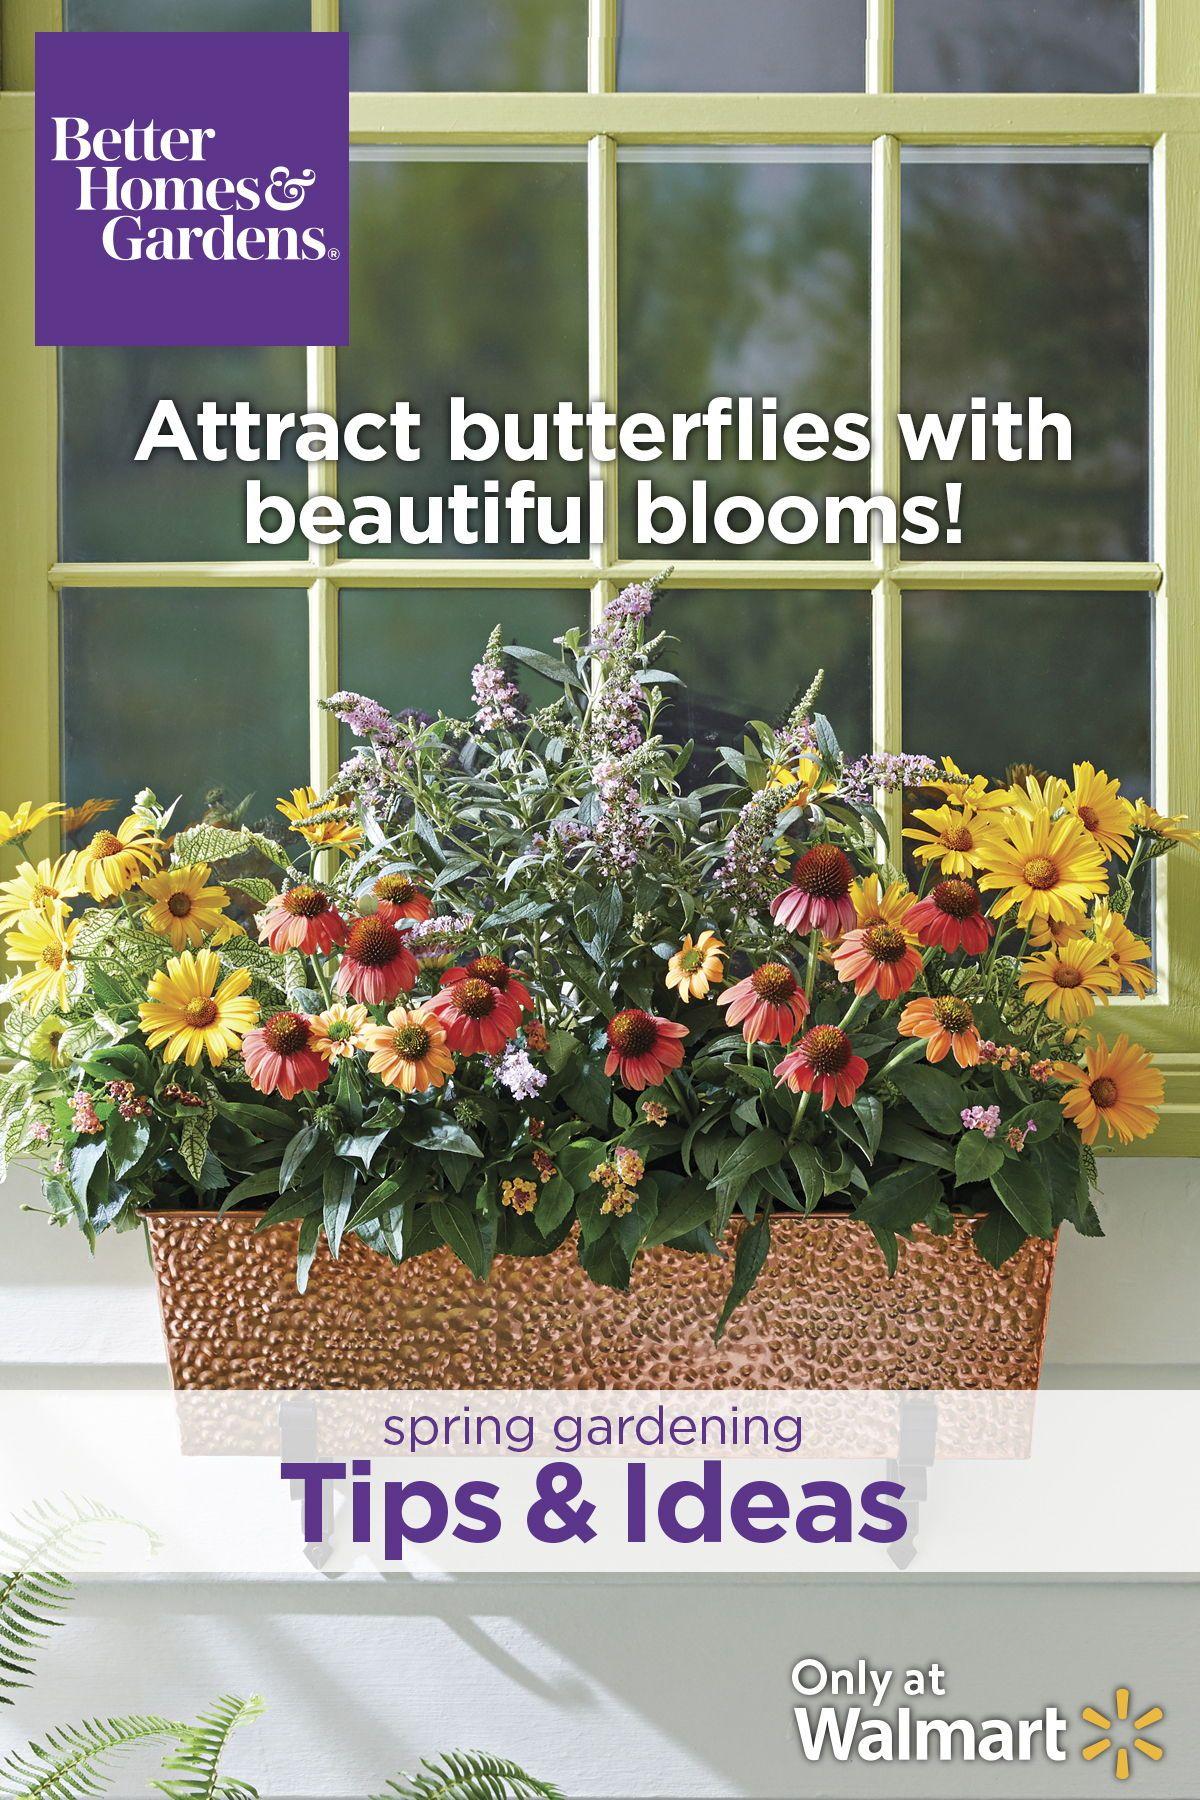 1ffc3cc08c7ec293fa4fa23506fe472b - Better Homes And Gardens Flowers Walmart